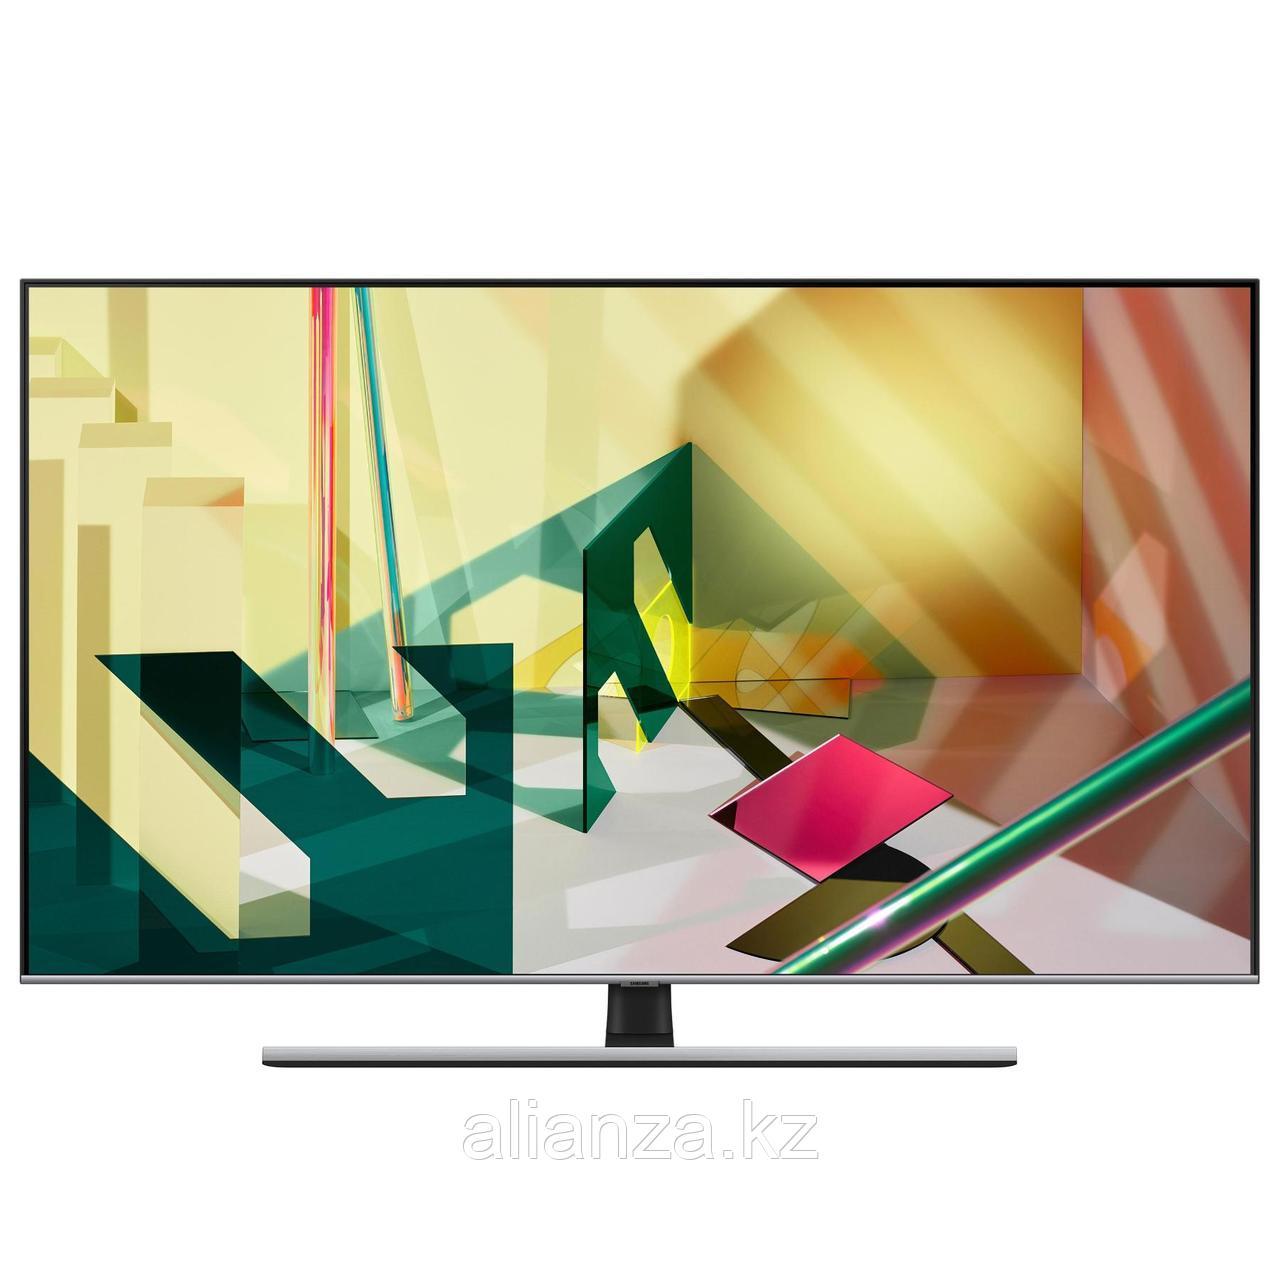 QLED телевизор Samsung QE65Q77TAUXRU